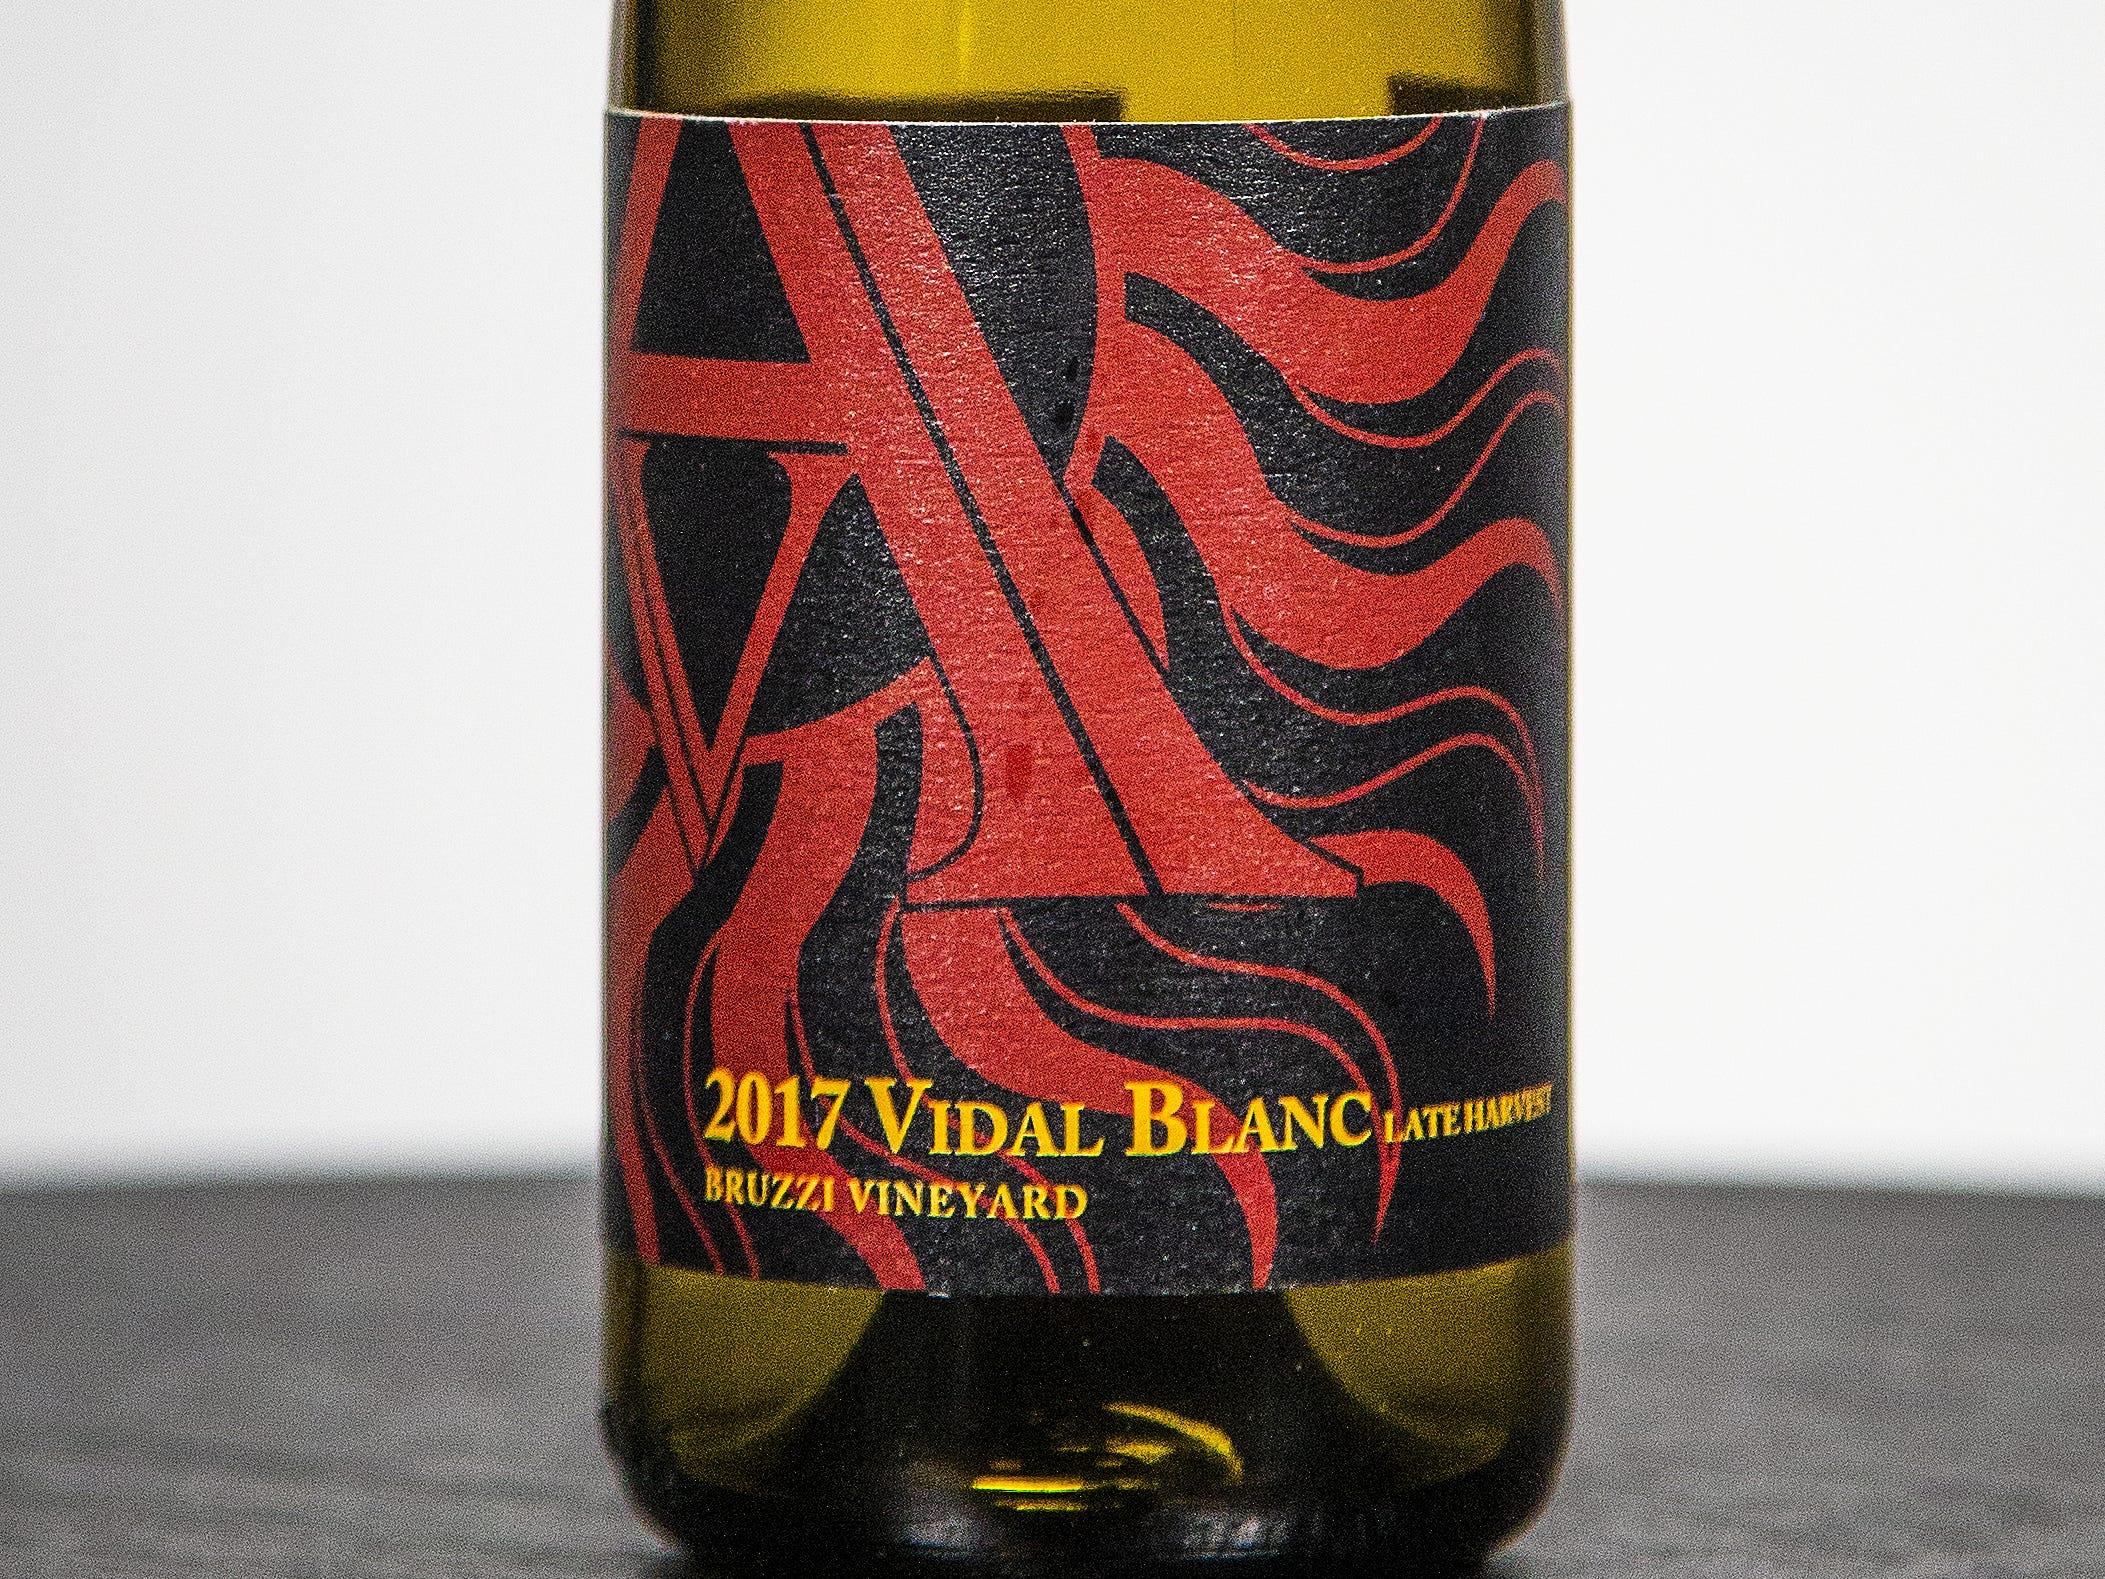 Best Dessert Wine: Arizona Stronghold Vineyards Late Harvest Vidal Blanc 2017. This wine was also named Best Late-Harvest Dessert Wine.